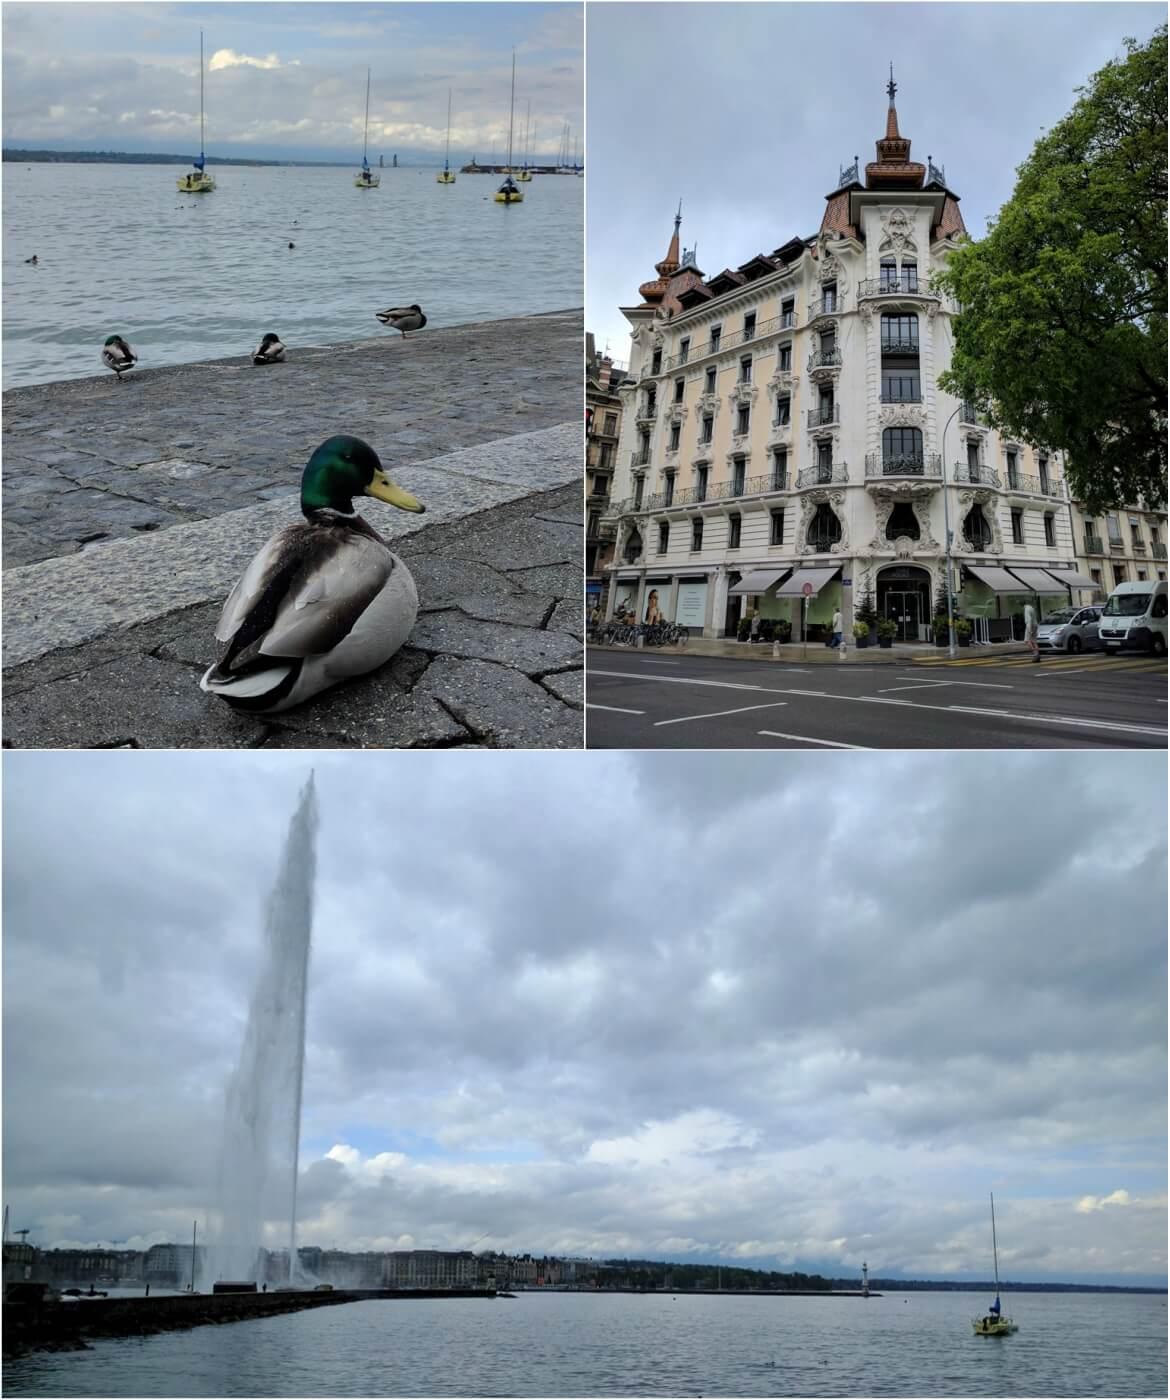 Architecture and nature in Geneva